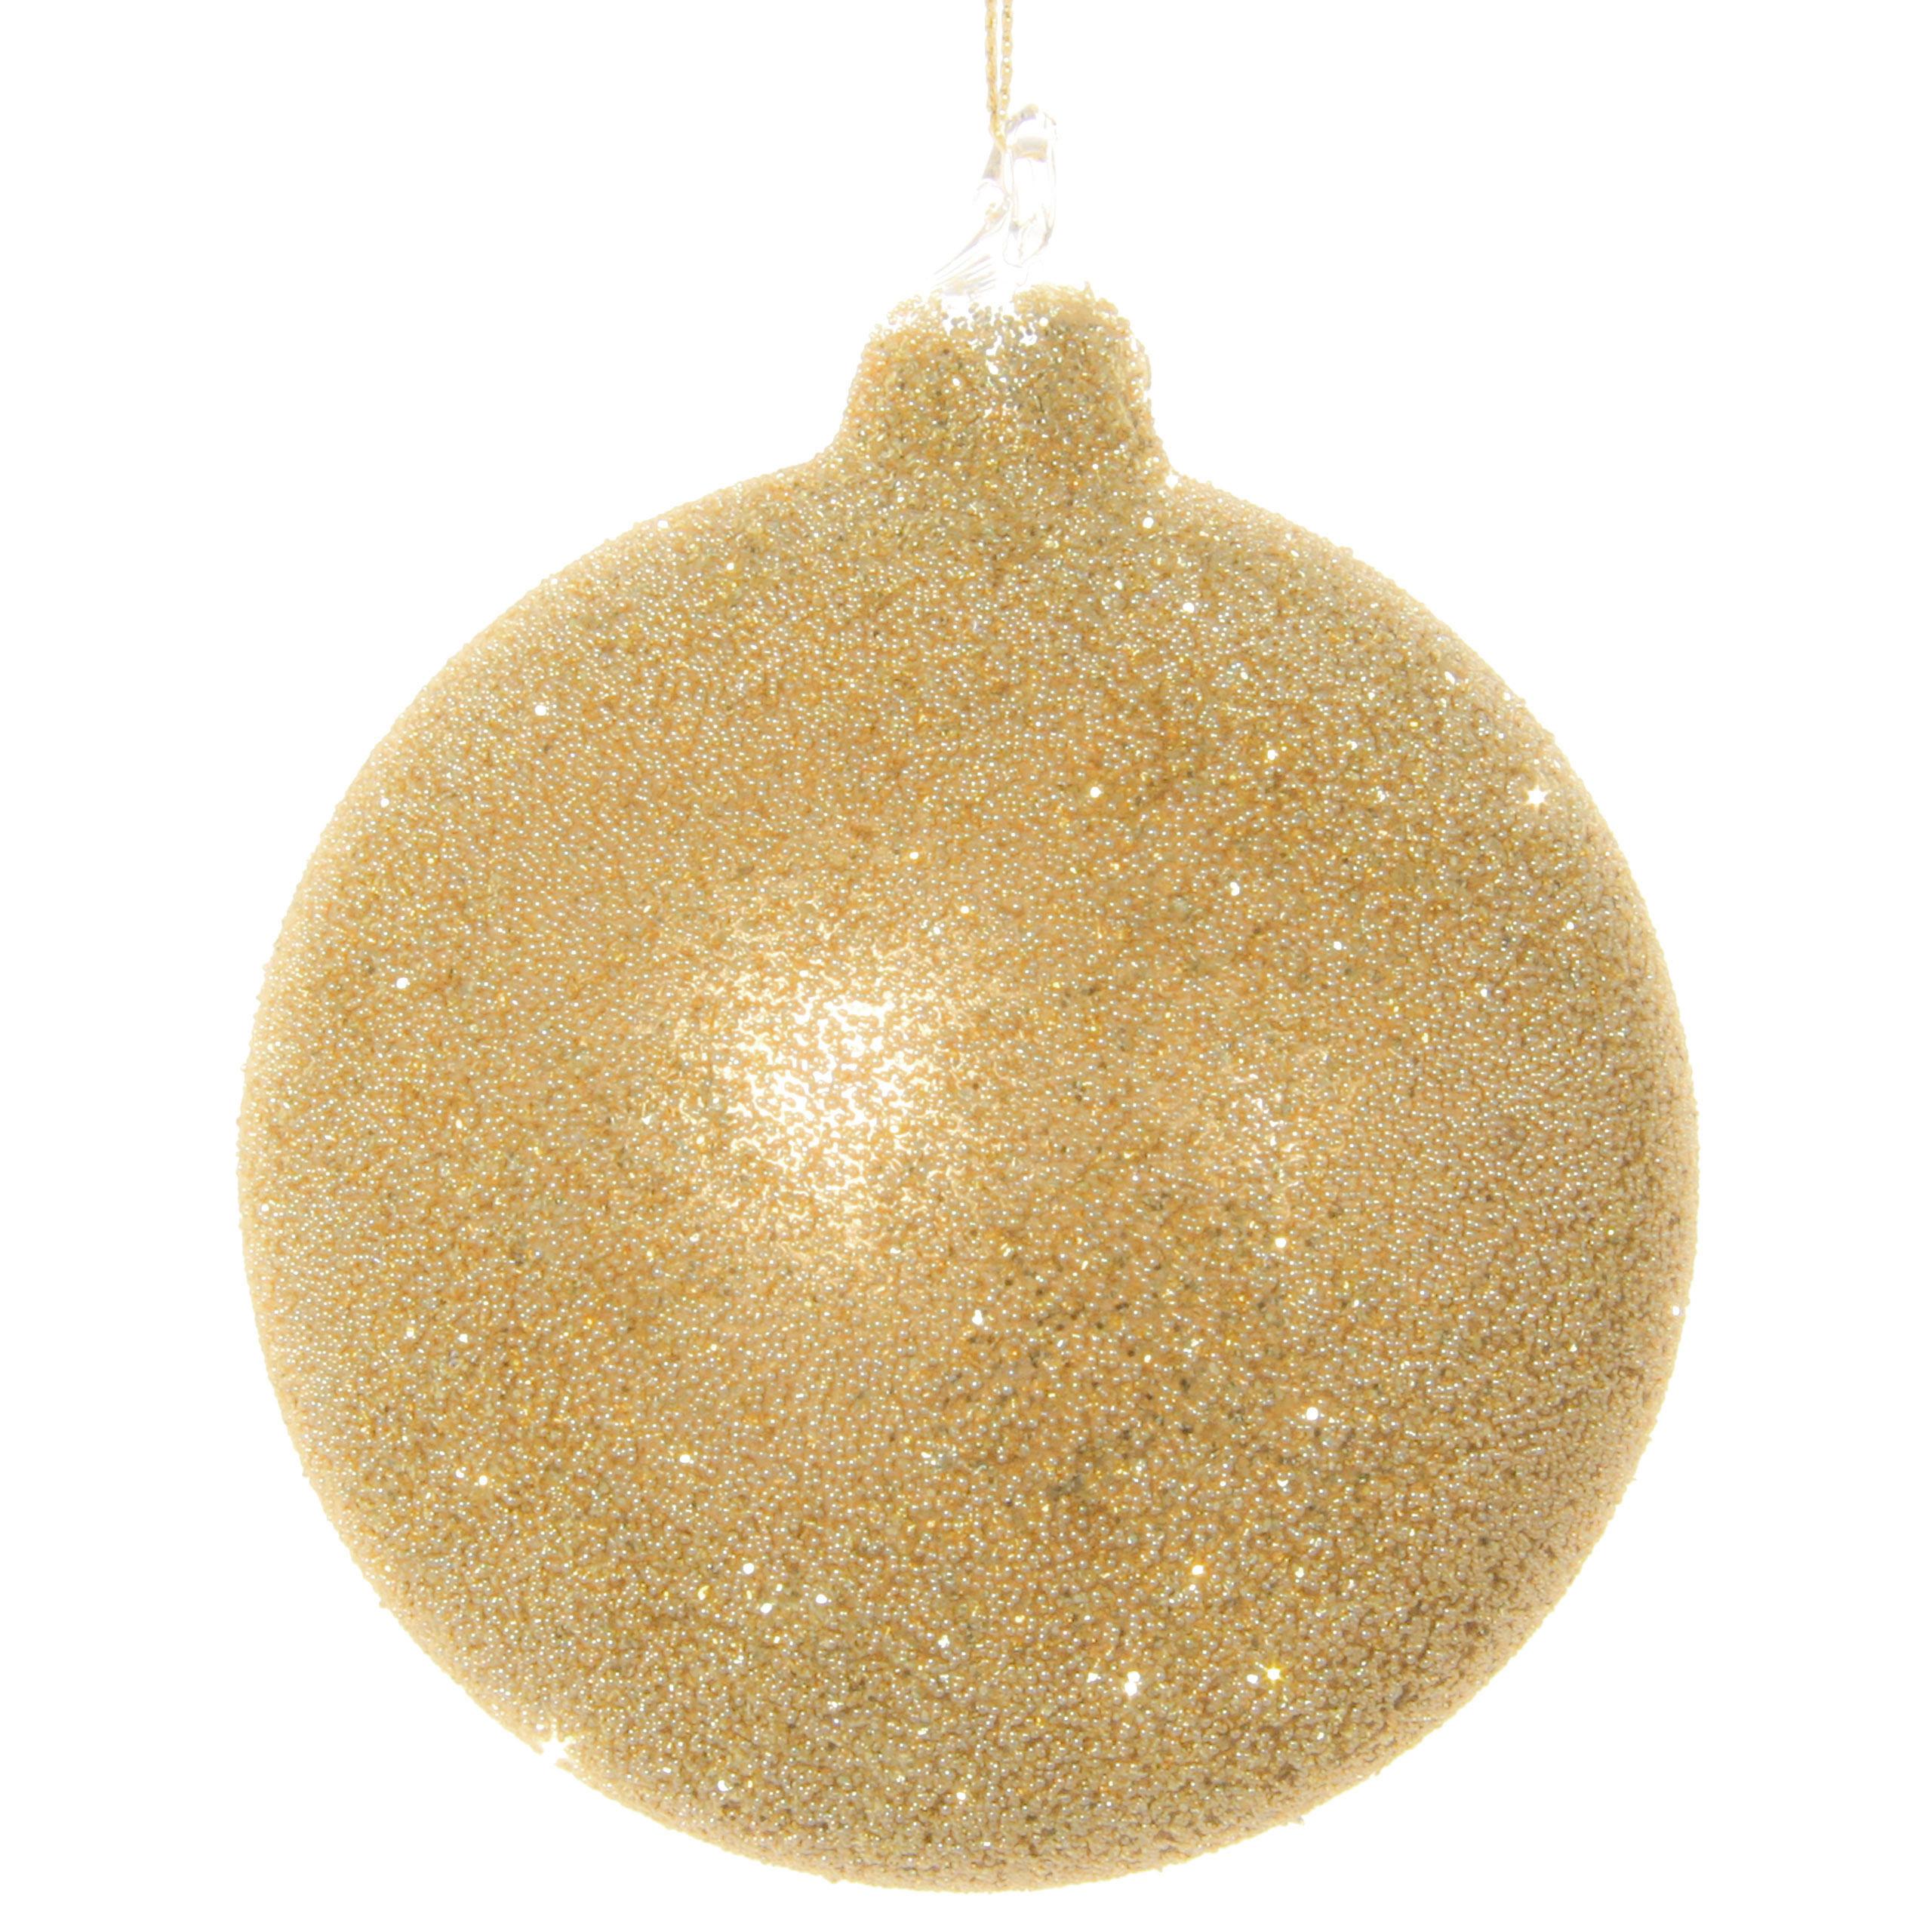 Shishi Christbaumkugel Glitter Perlen Kornig 8cm Gold Weihnachten